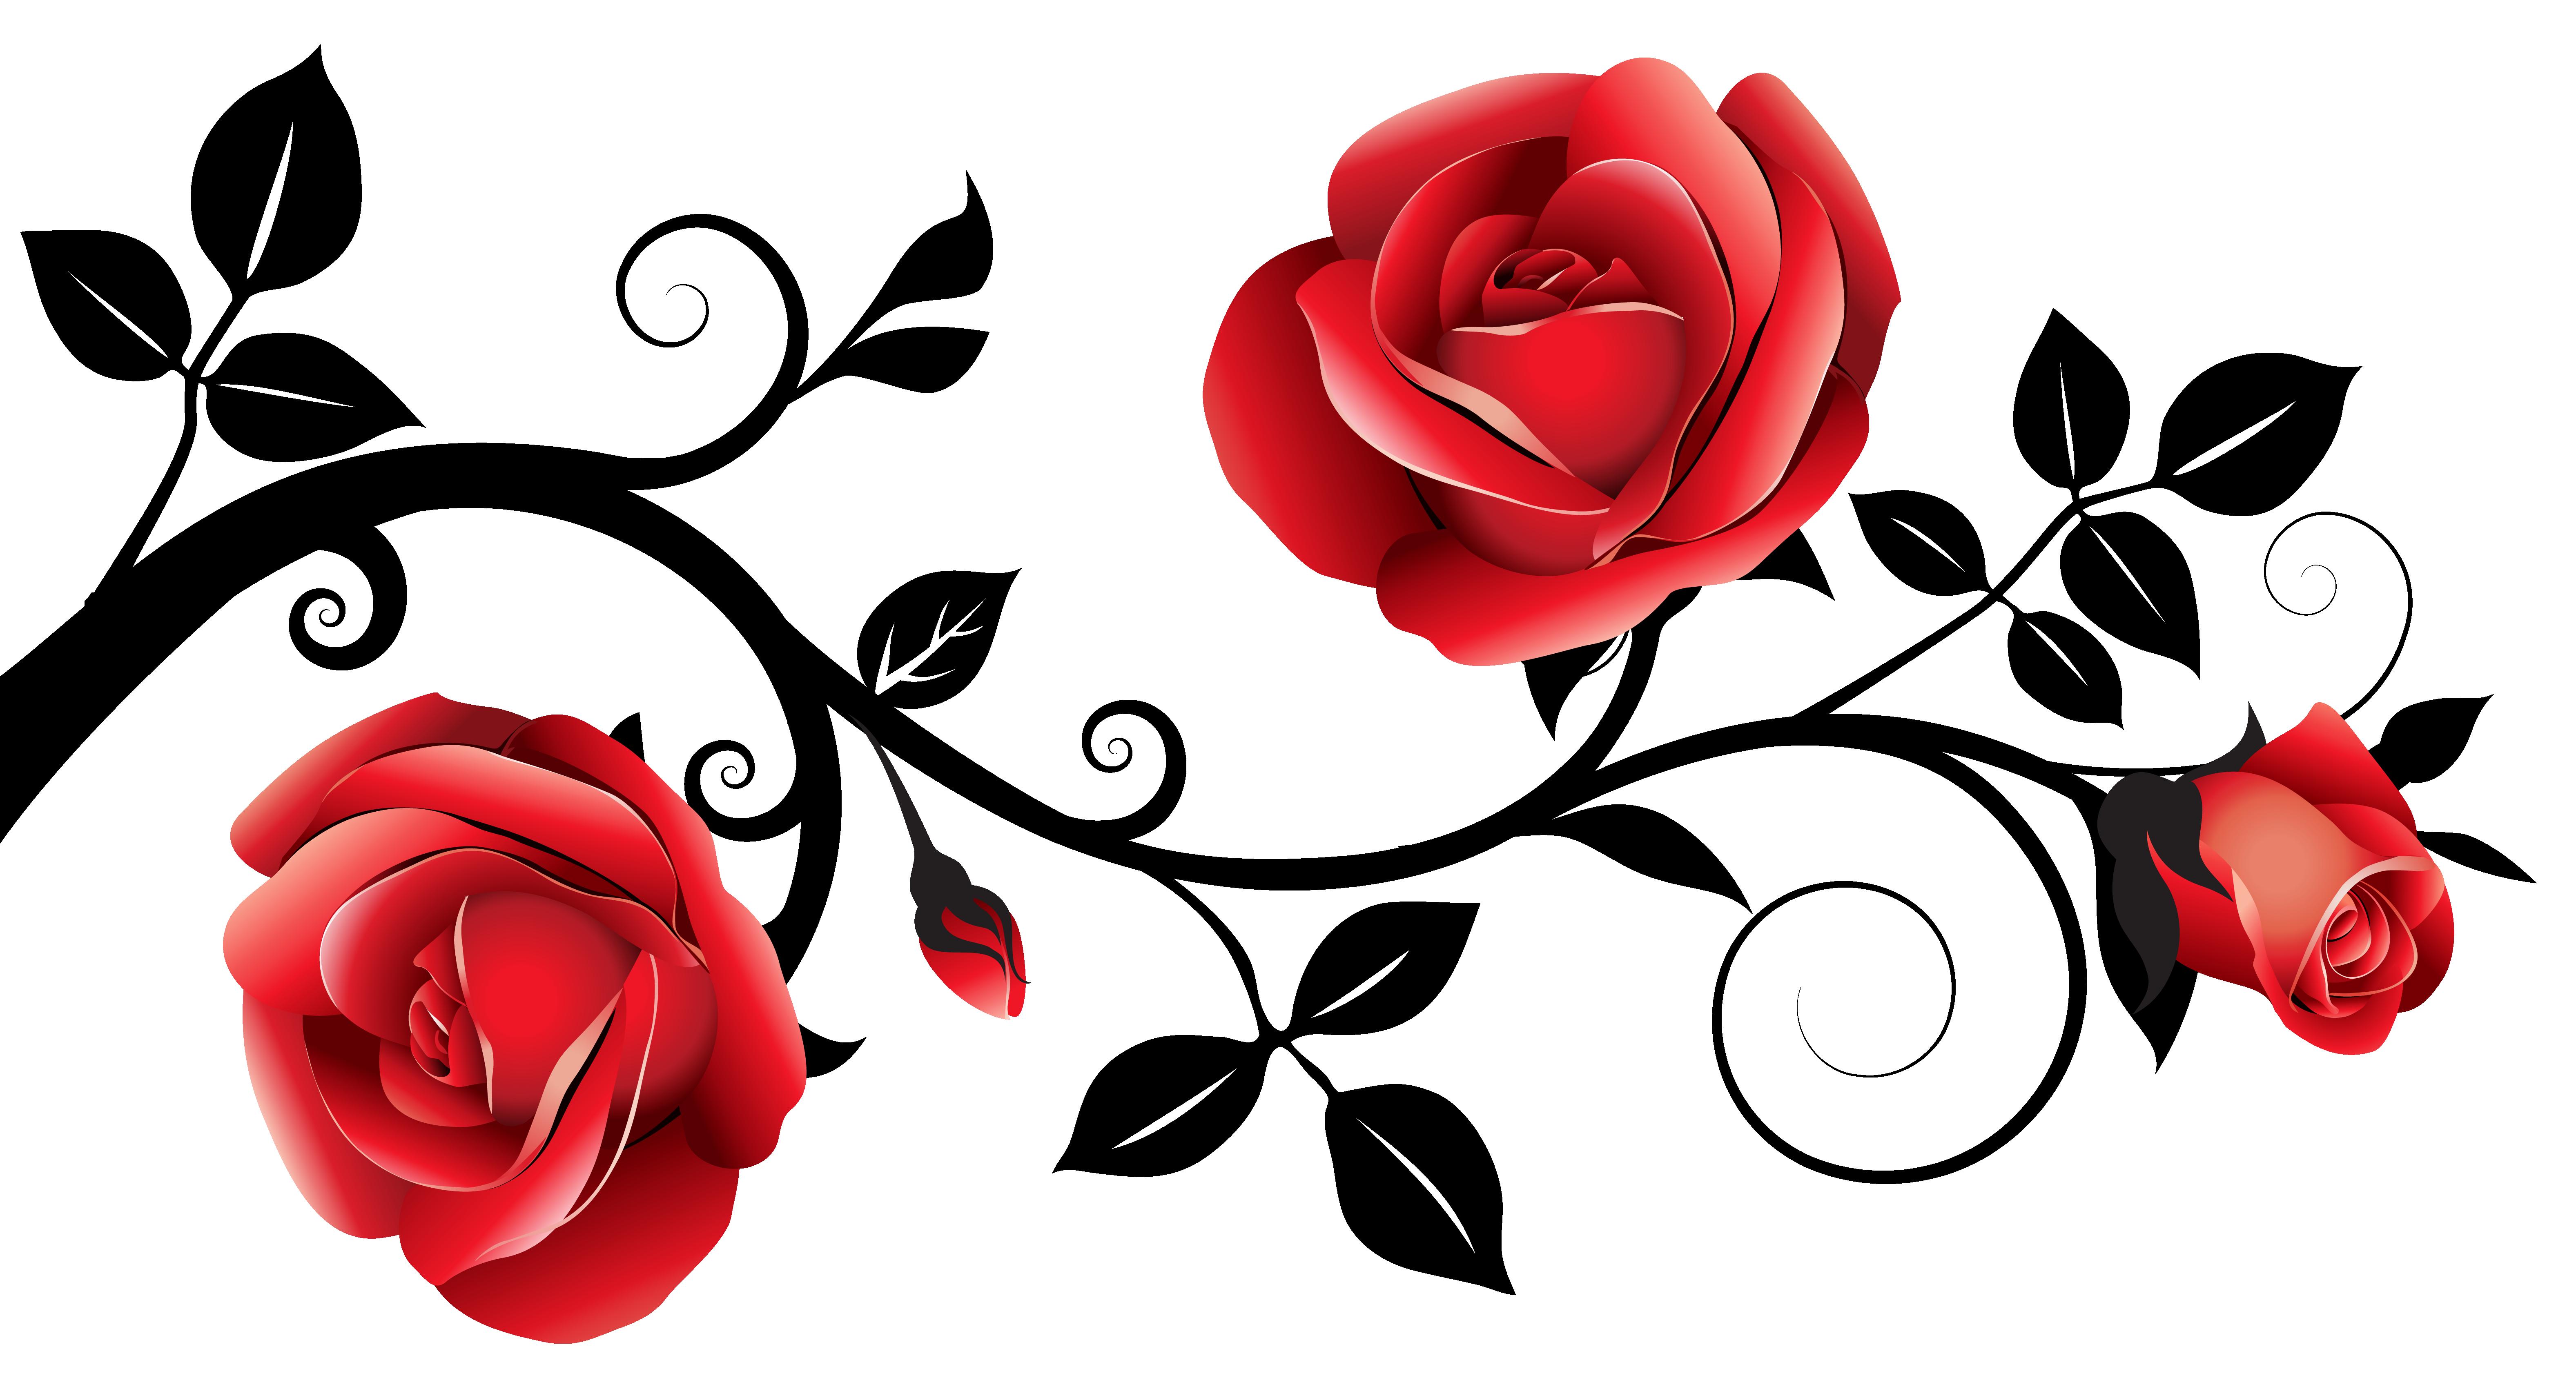 Pin by Prajesh Sharma on Girl | Rose vines, Rose vine ... vector stock